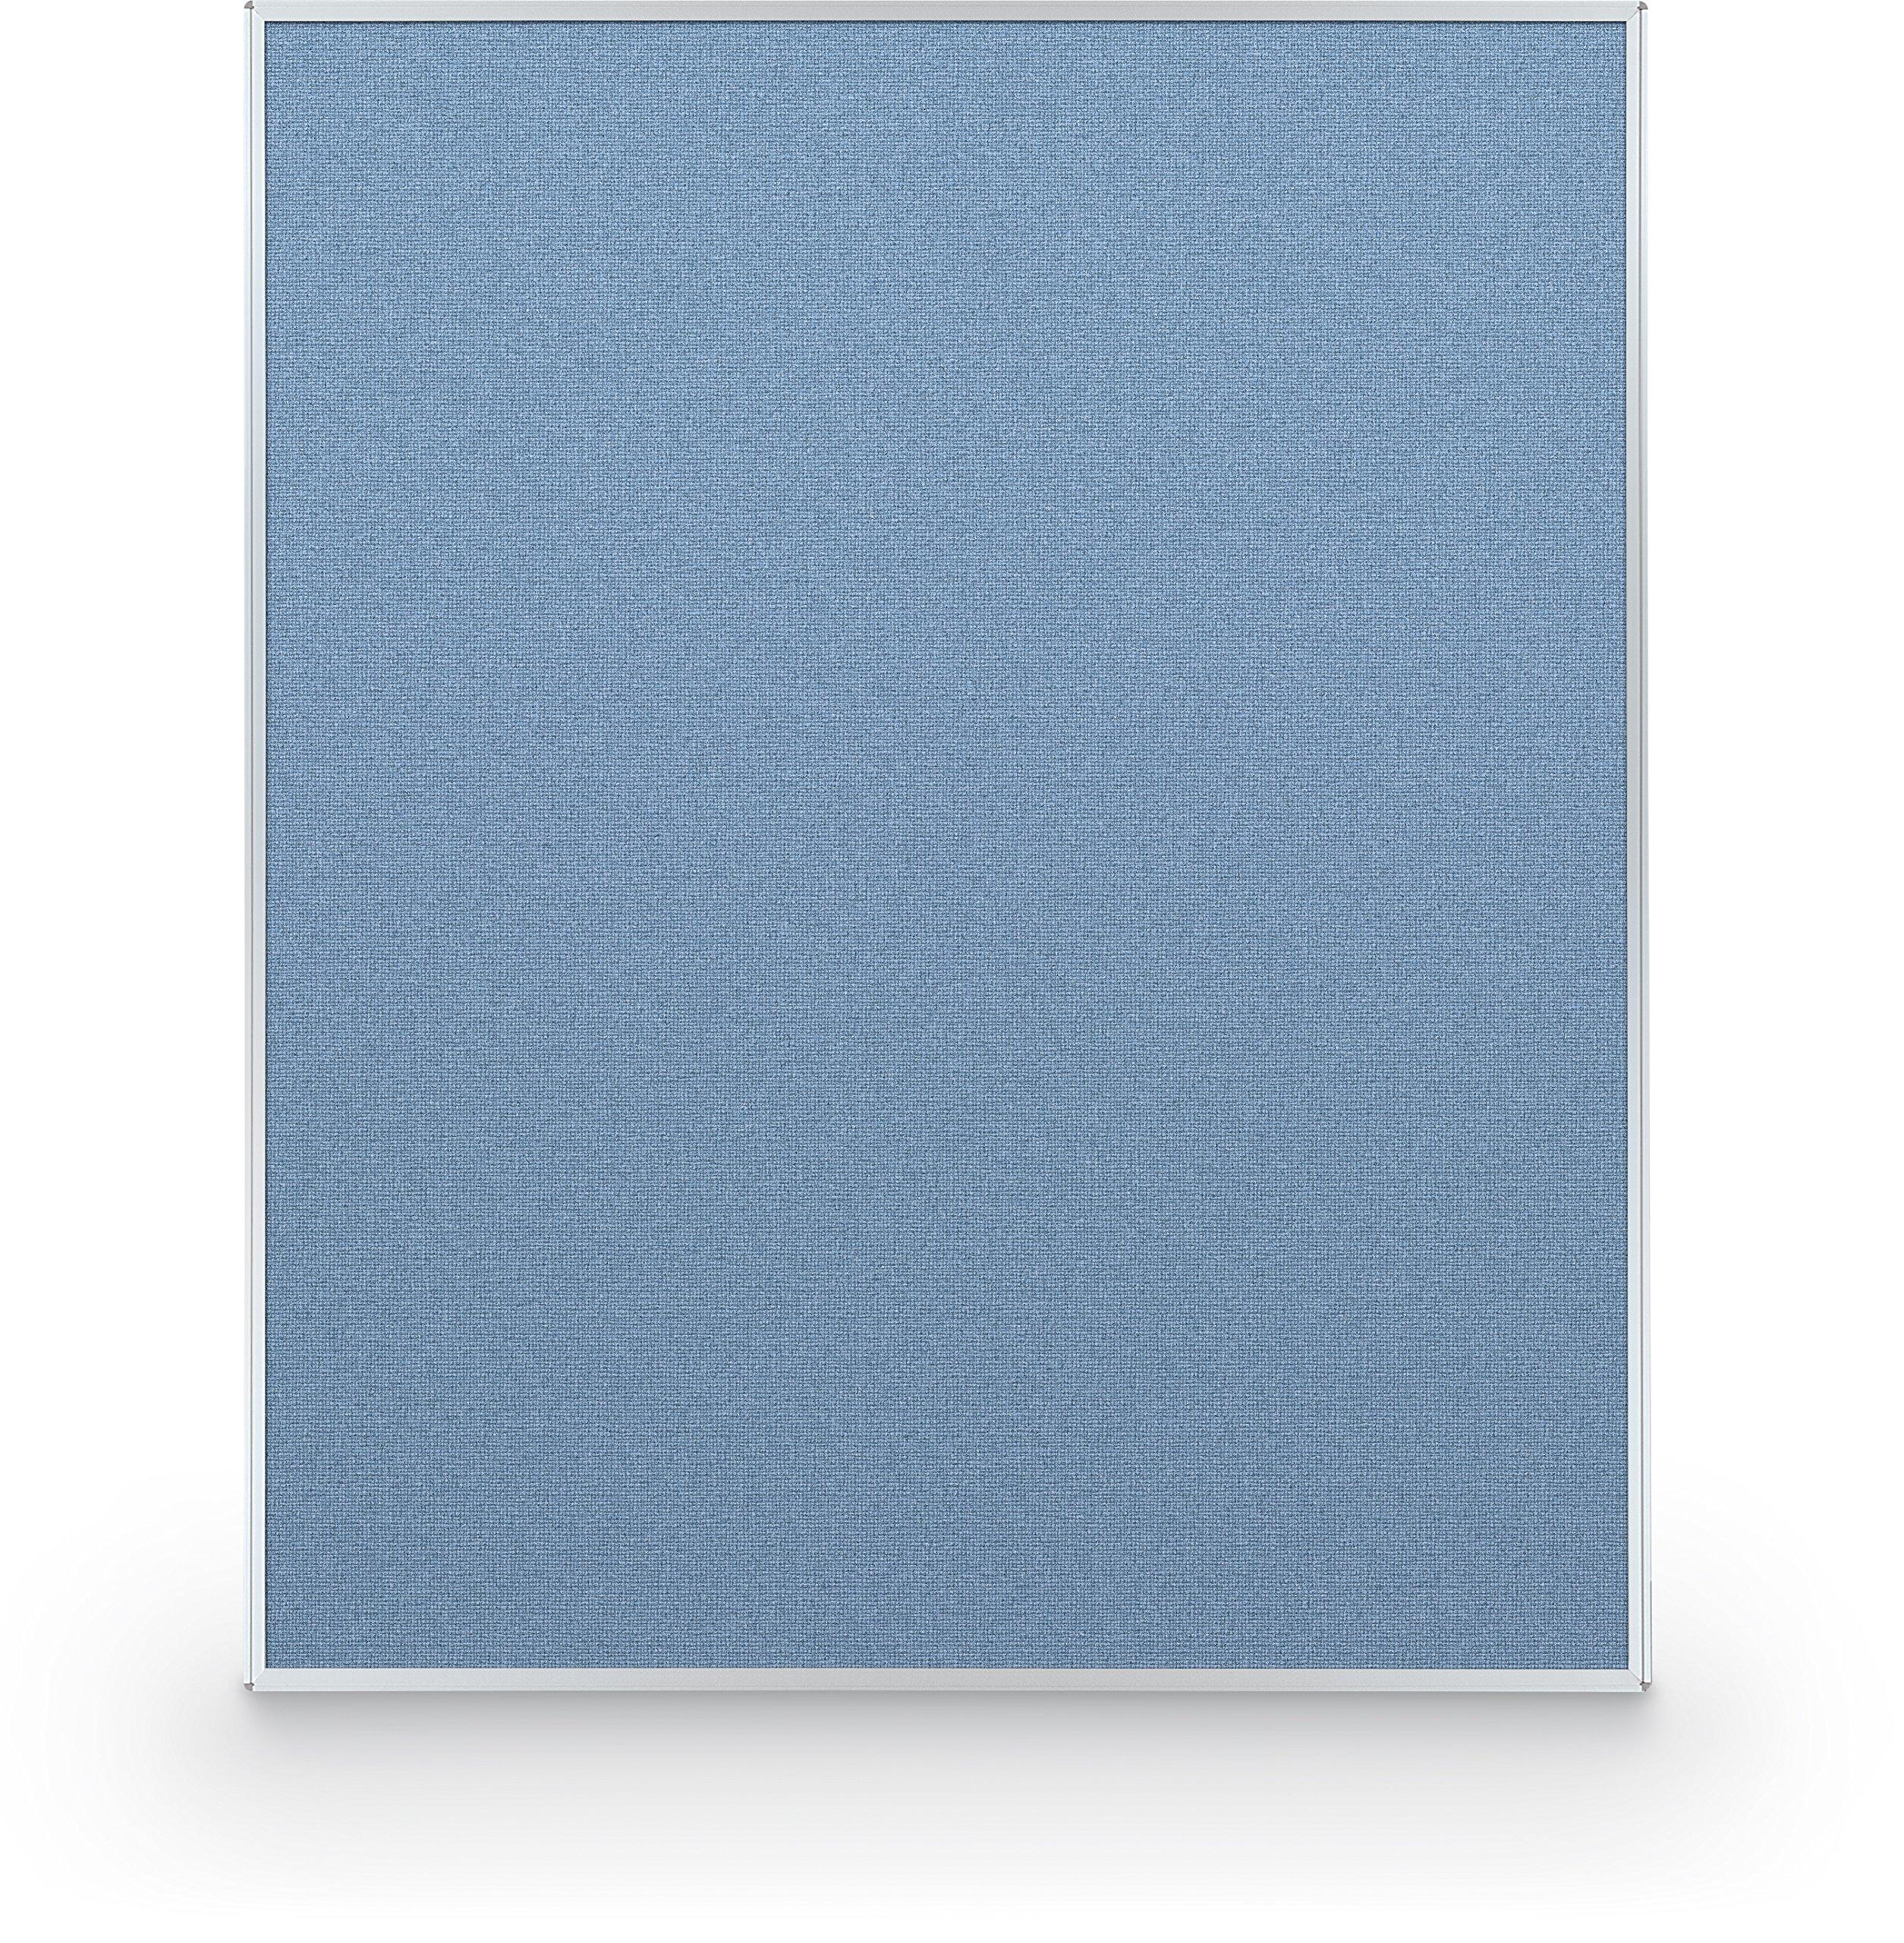 Best-Rite 72 x 60 Inch Standard Modular Divider Panel, Blue Fabric Panel, (66220-87)